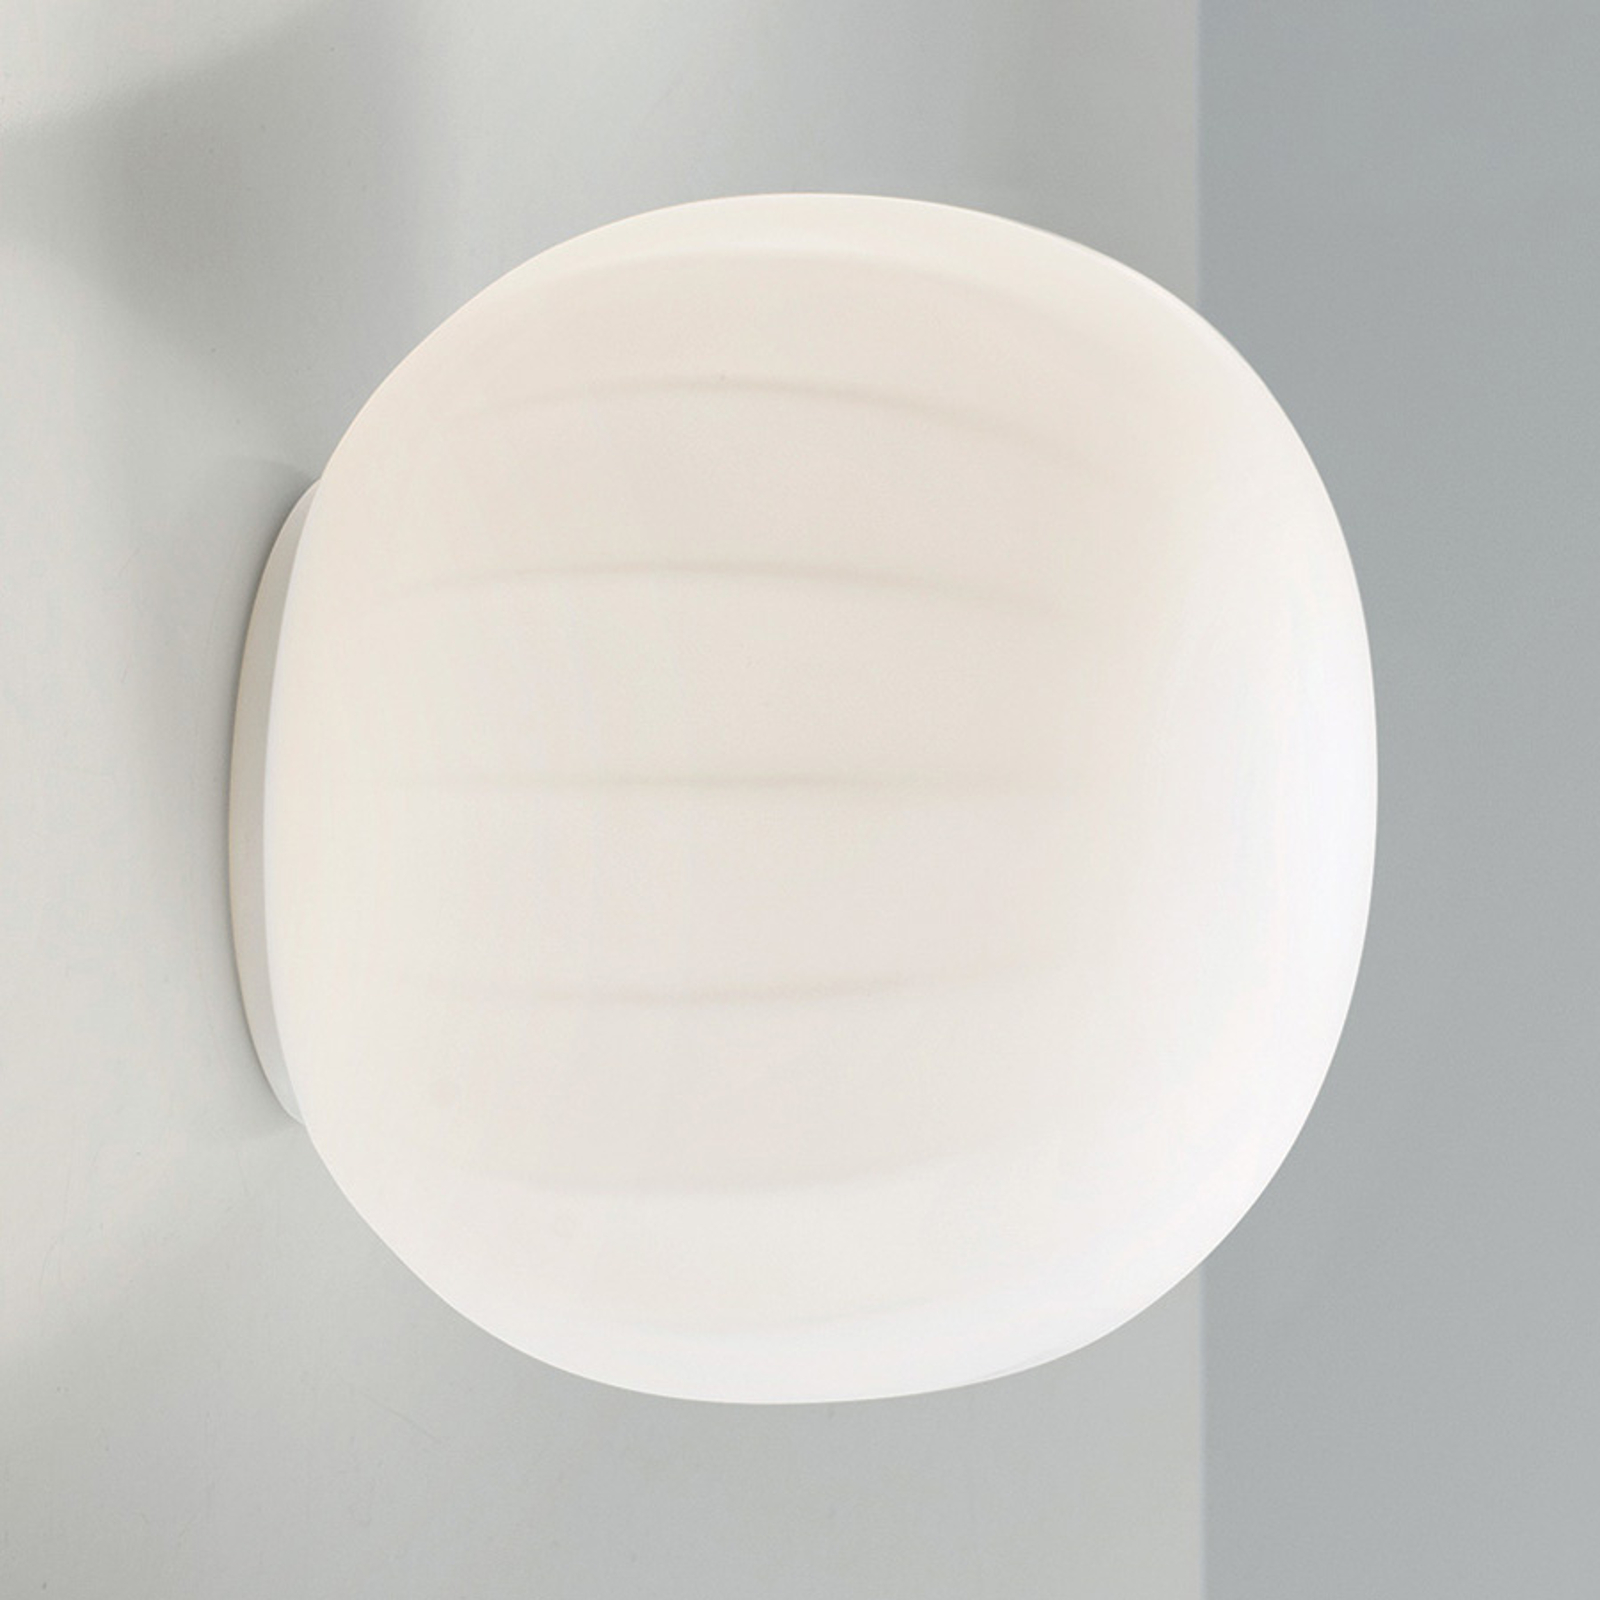 Luceplan Mesh wandlamp Ø 18 cm